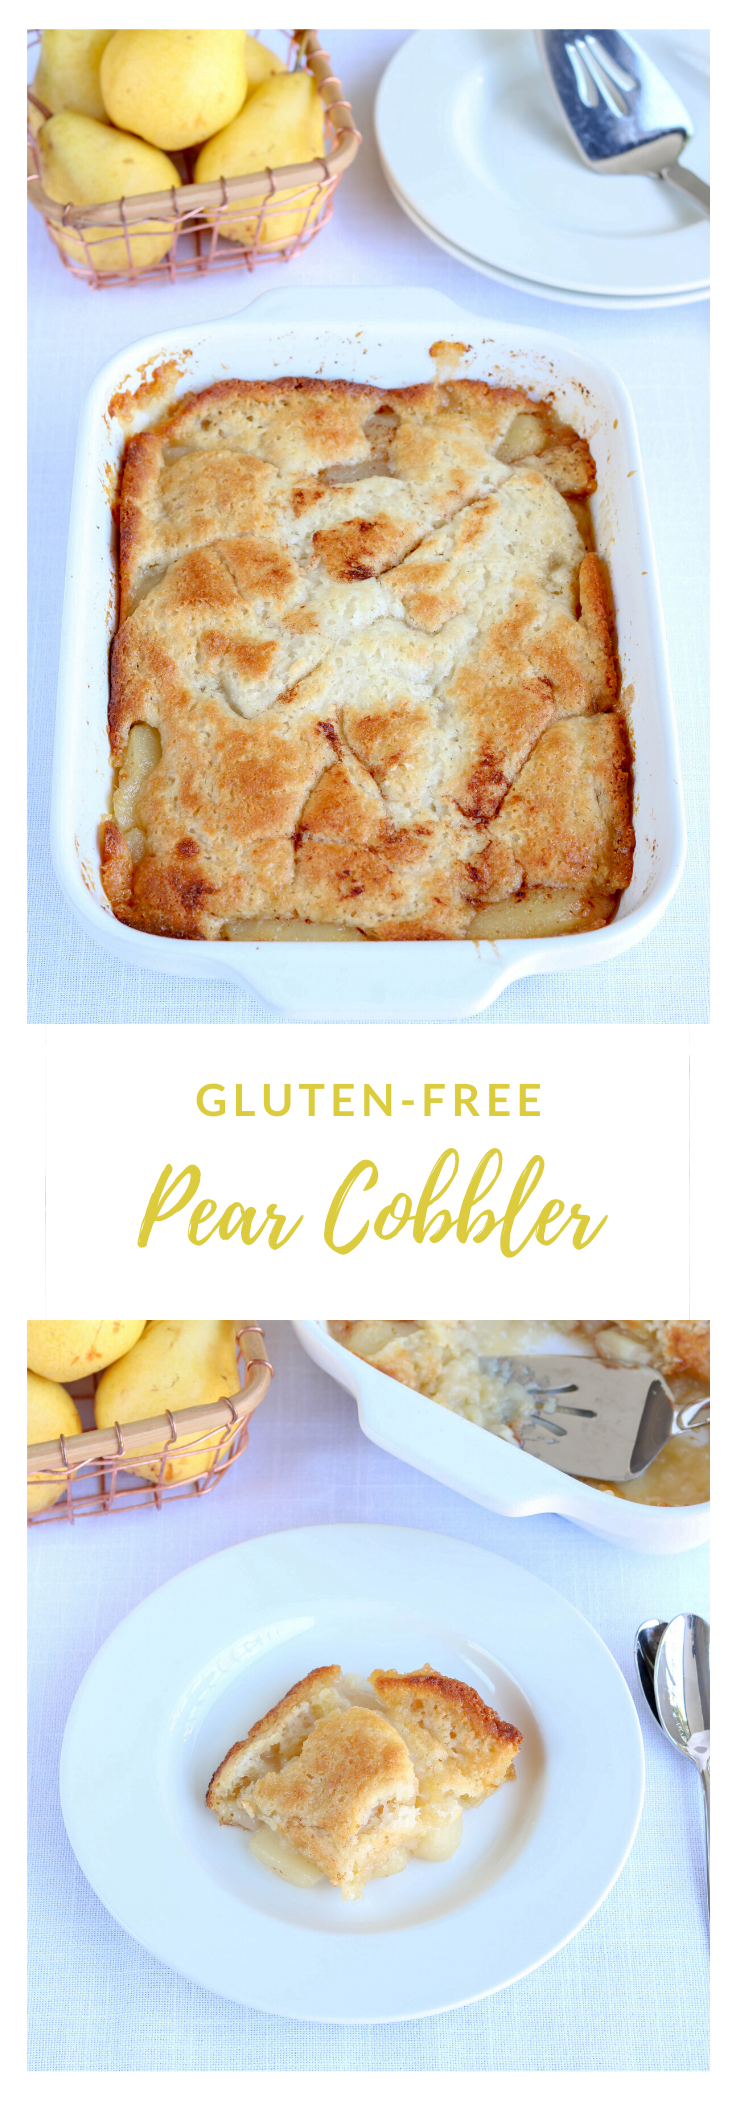 gluten-free-pear-cobbler